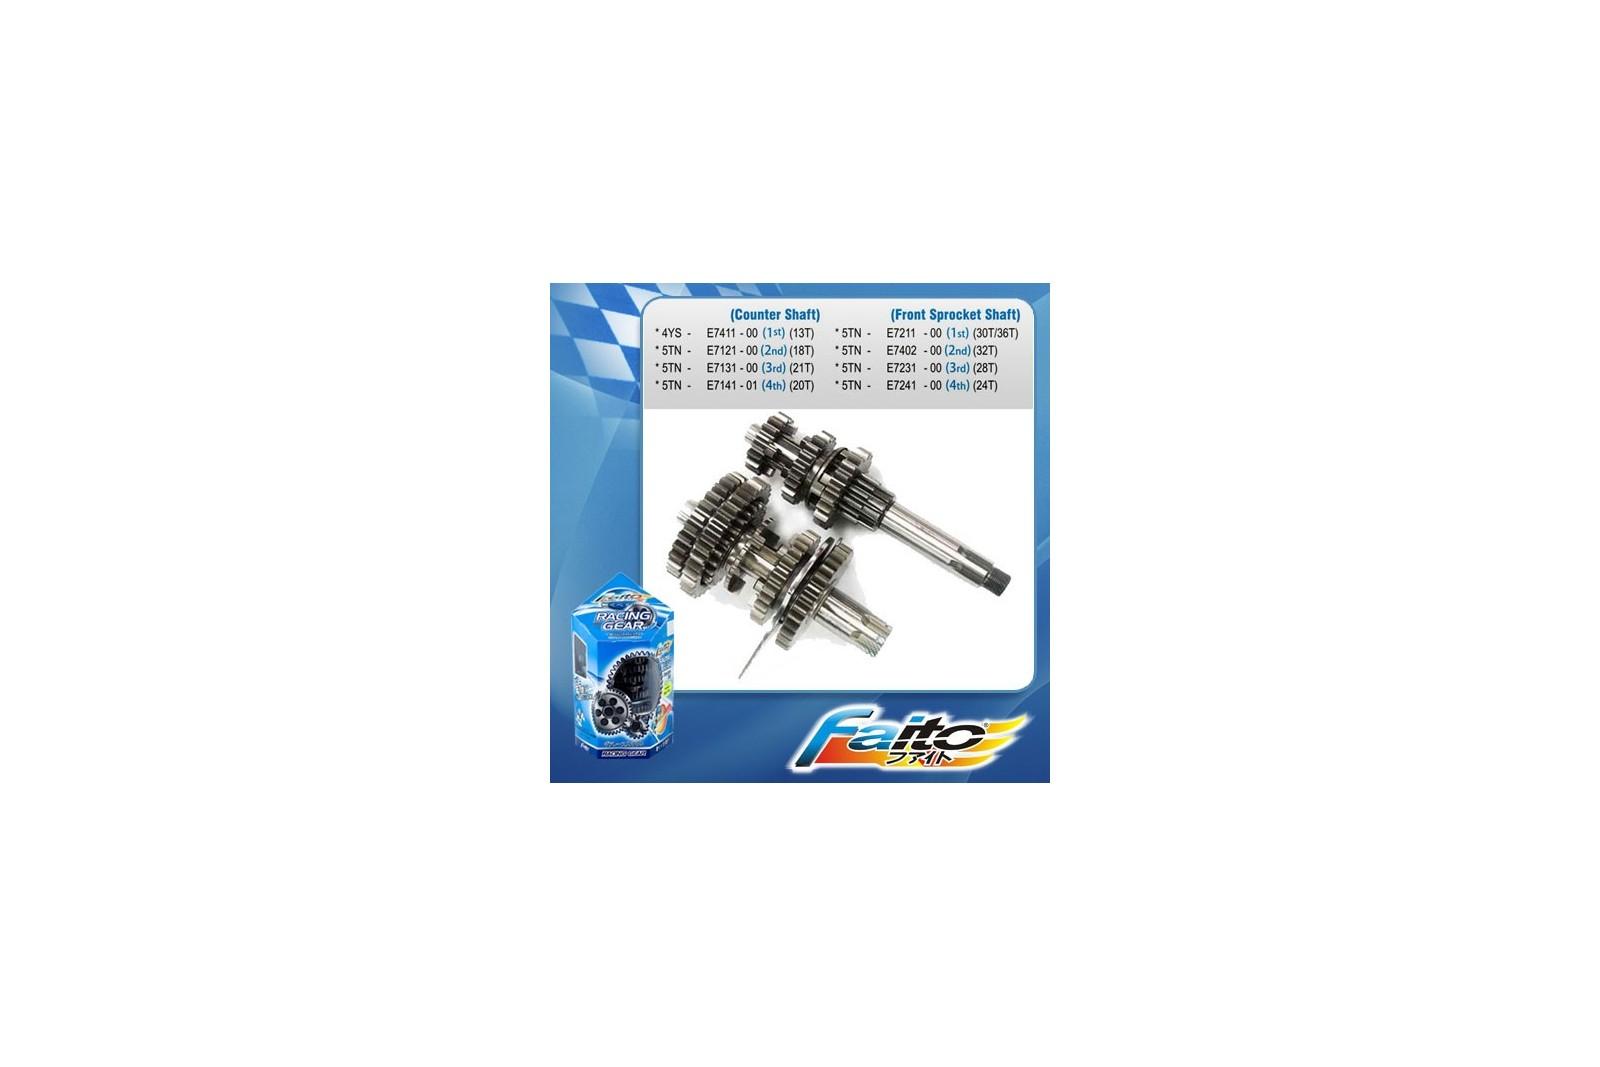 Sprocket Ratio Lc135 5s